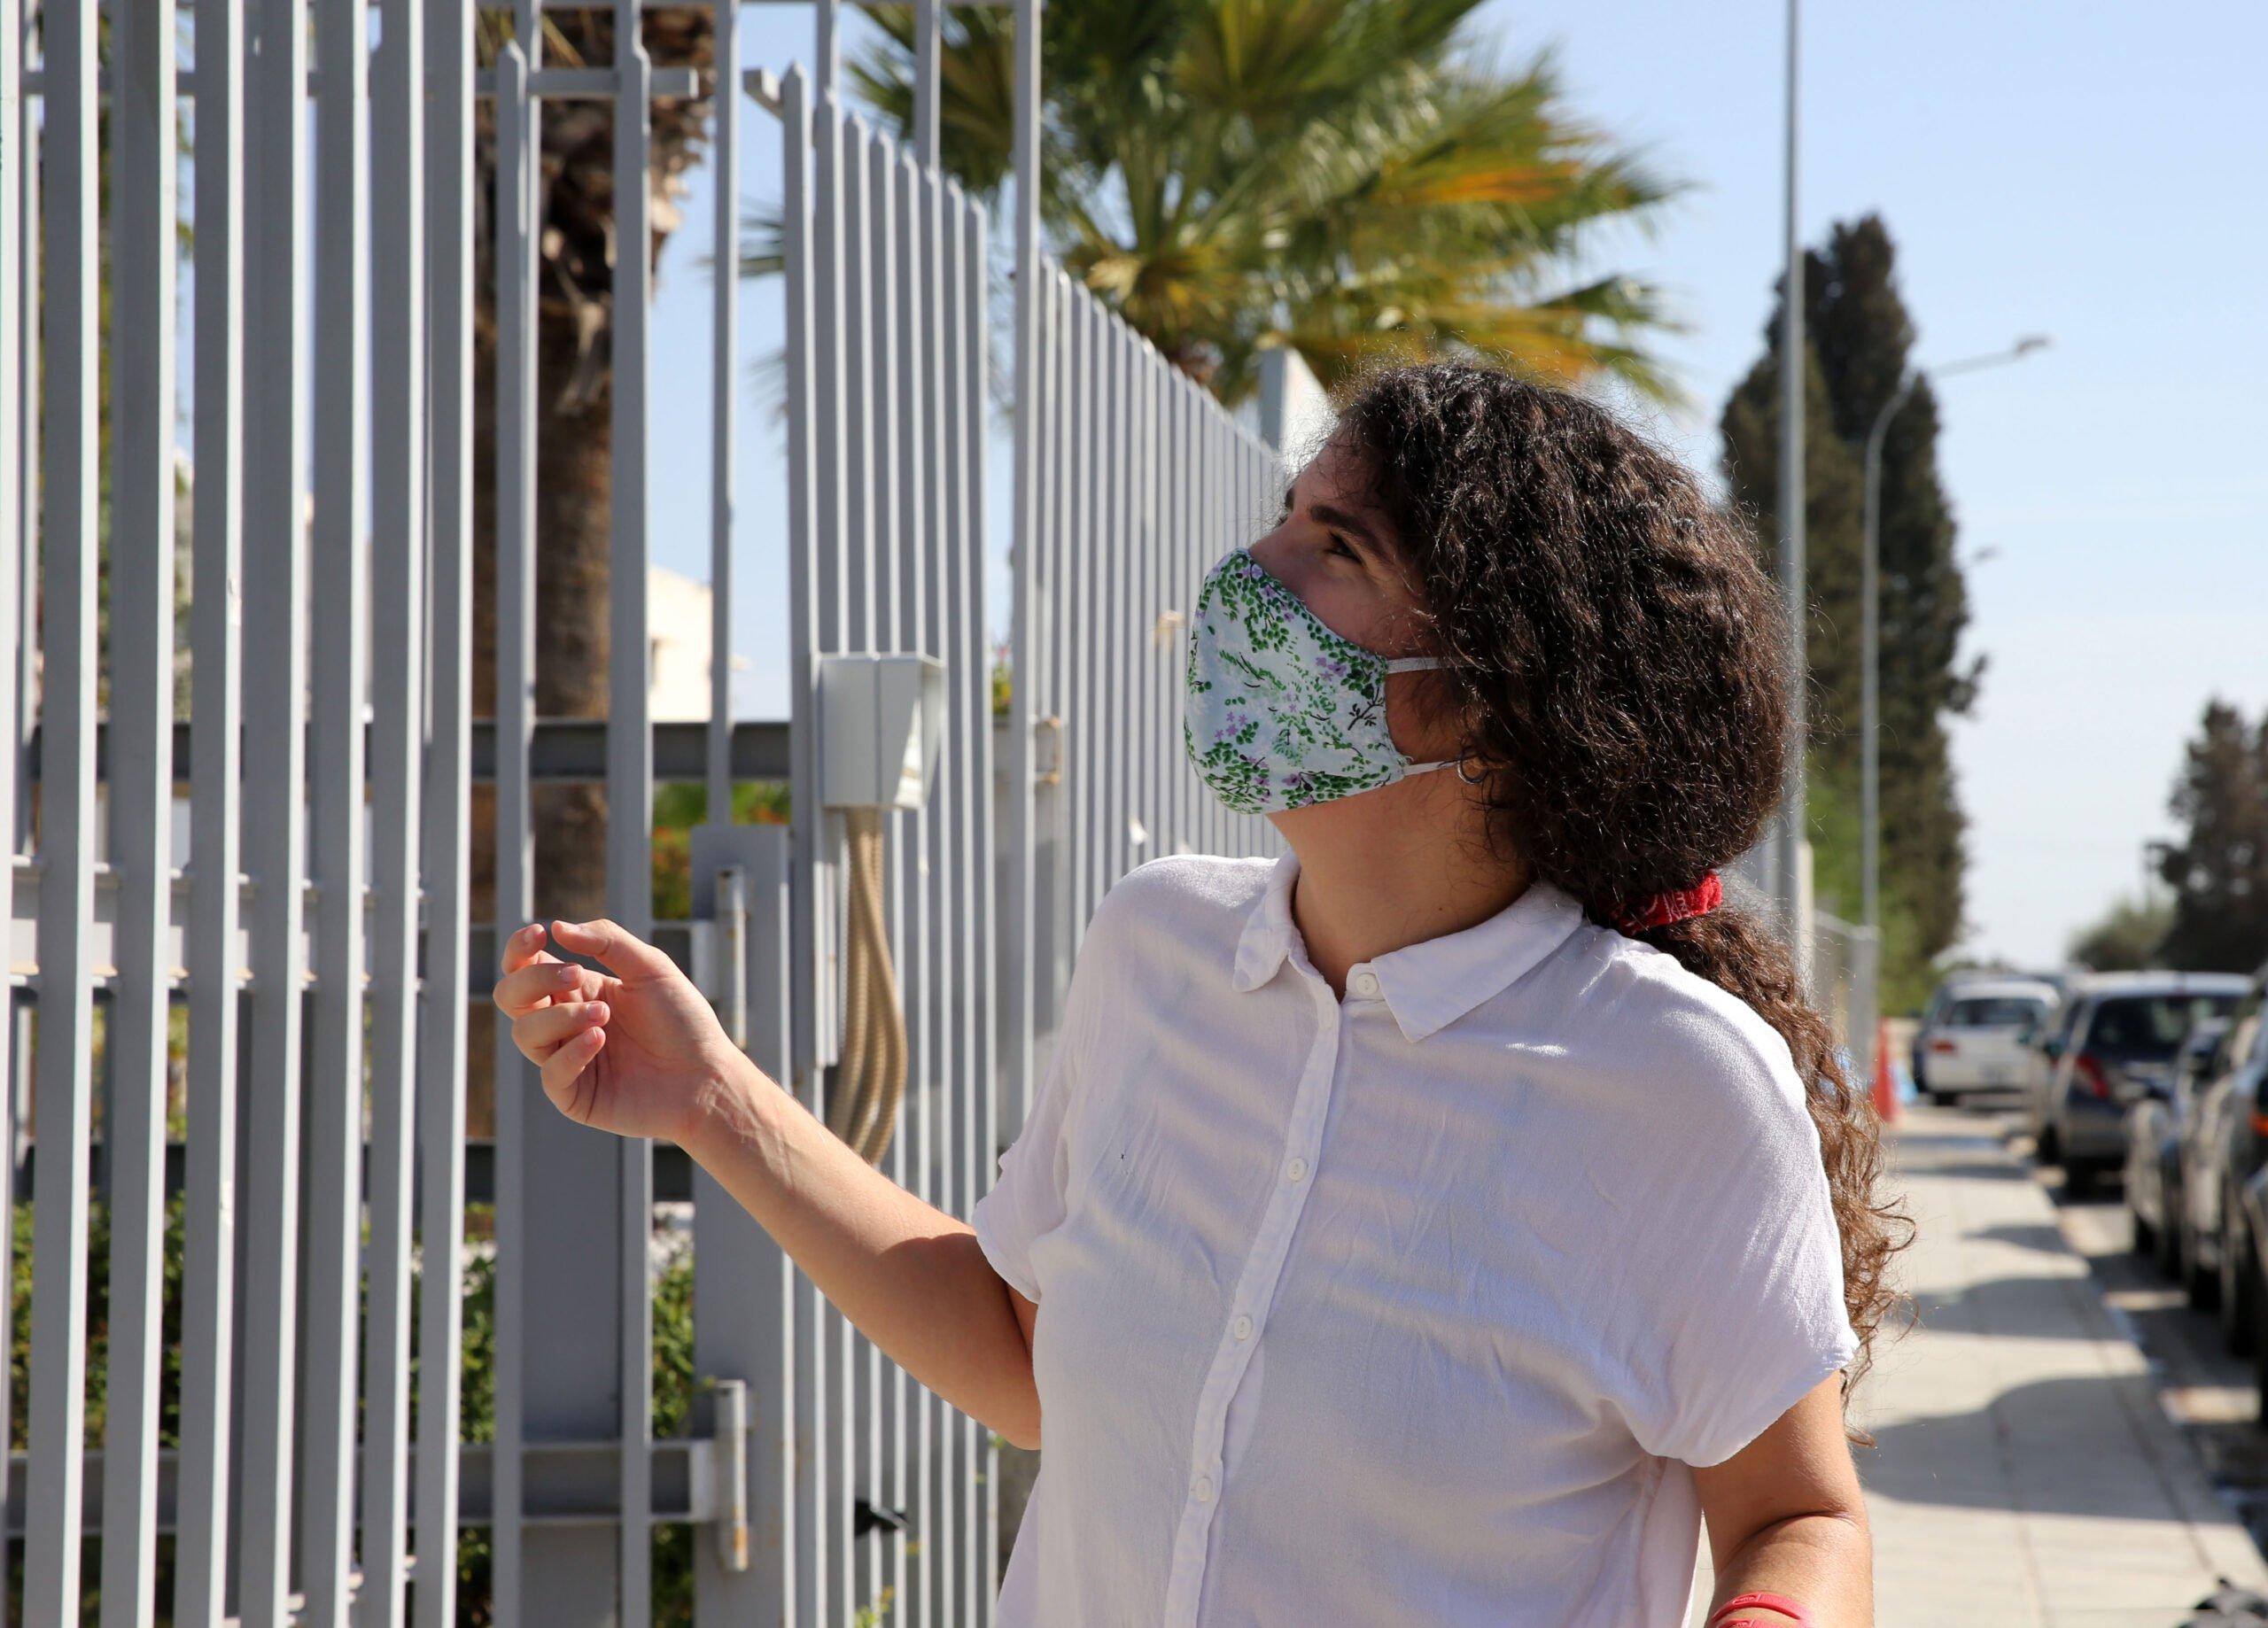 Coronavirus: Υπουργείο για να ενθαρρύνει τους πρωτοβάθμιους μαθητές να φορούν μάσκες